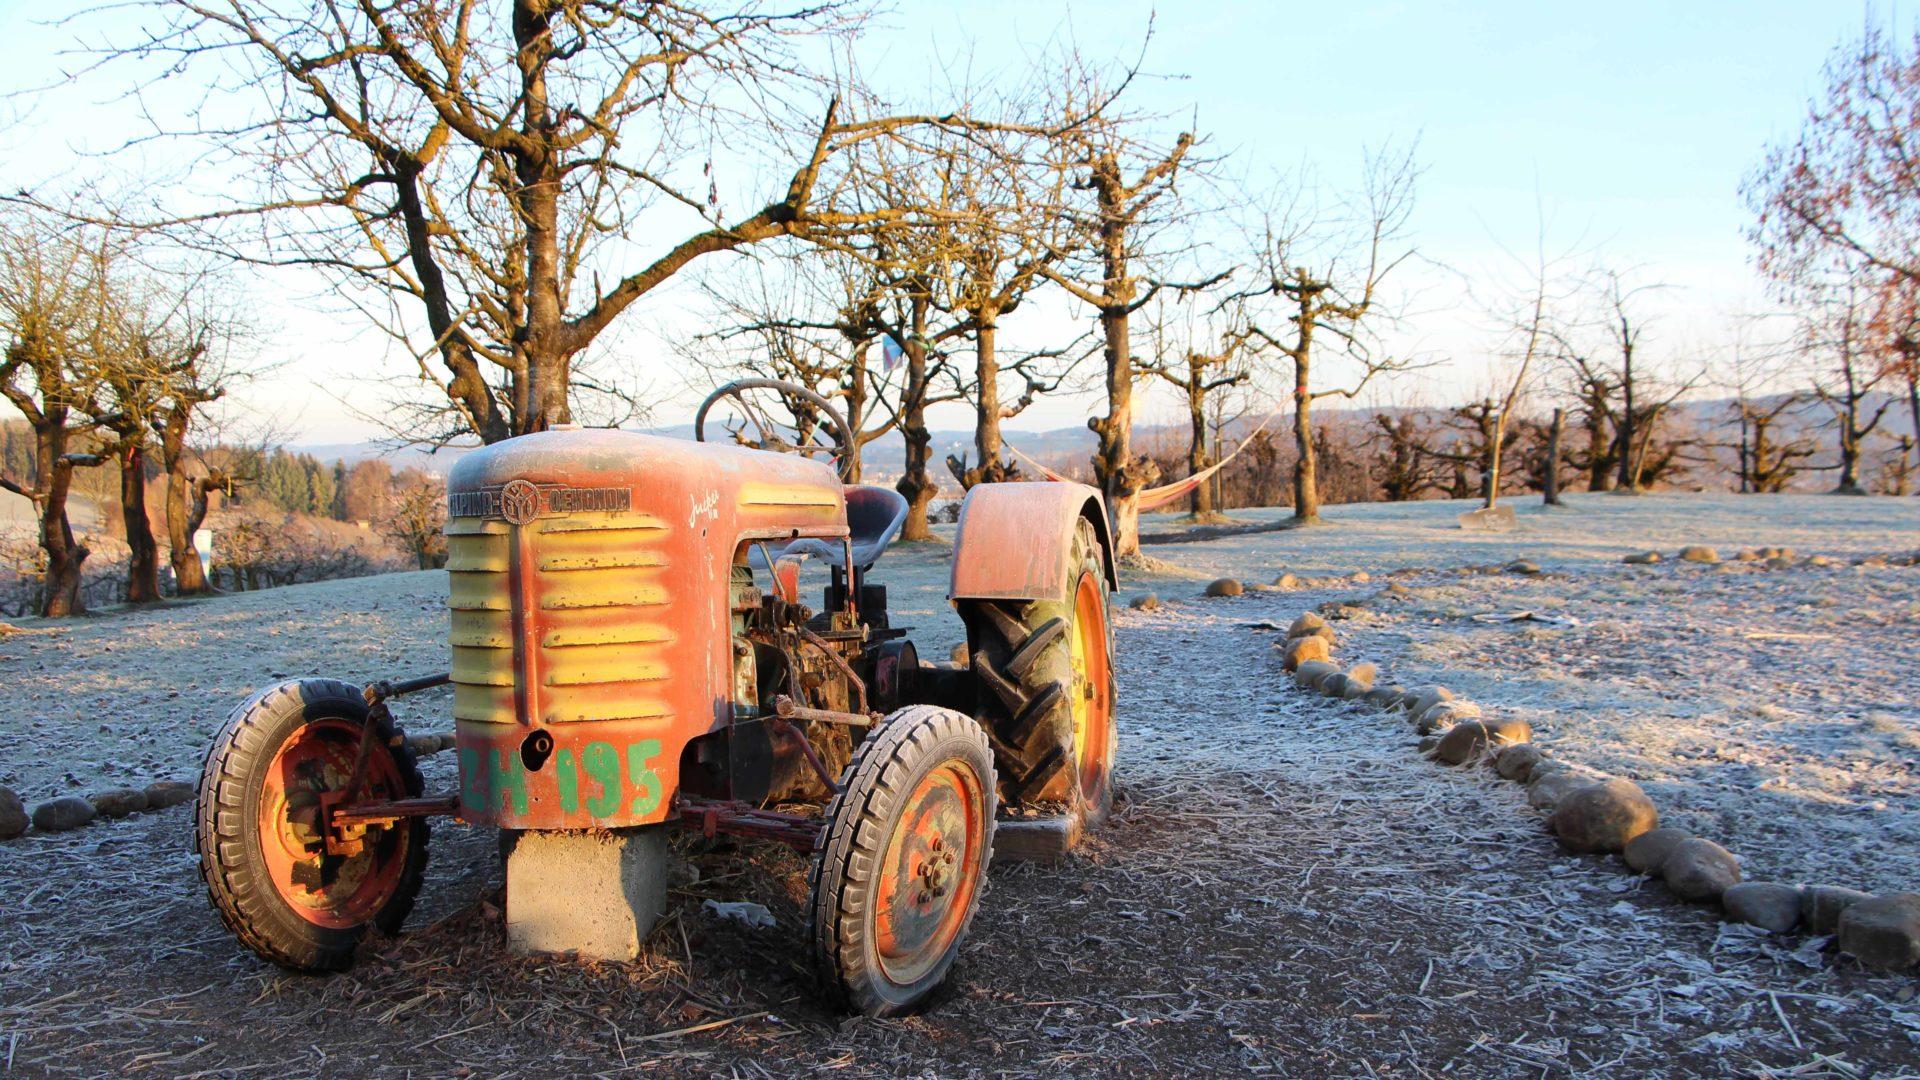 Juckers Traktor